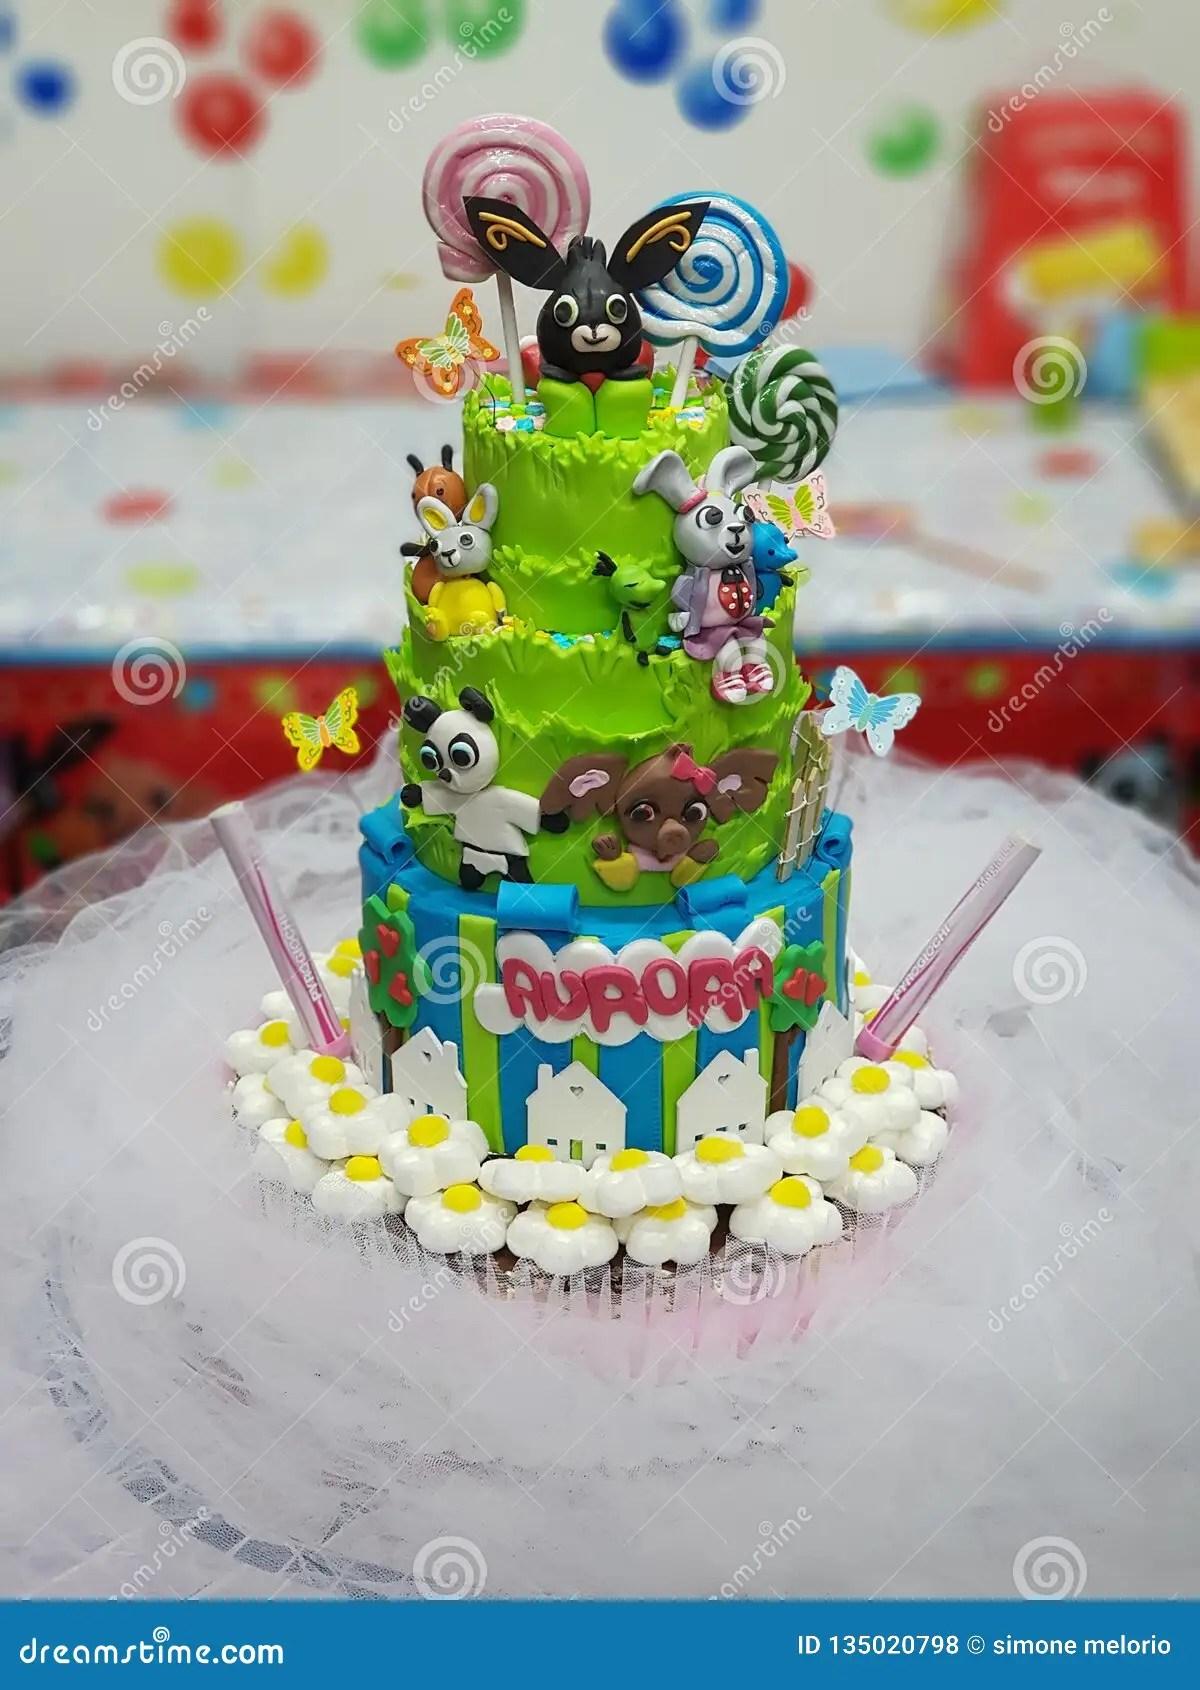 Cake For Birthday Stock Photo Image Of Birthday Kids 135020798